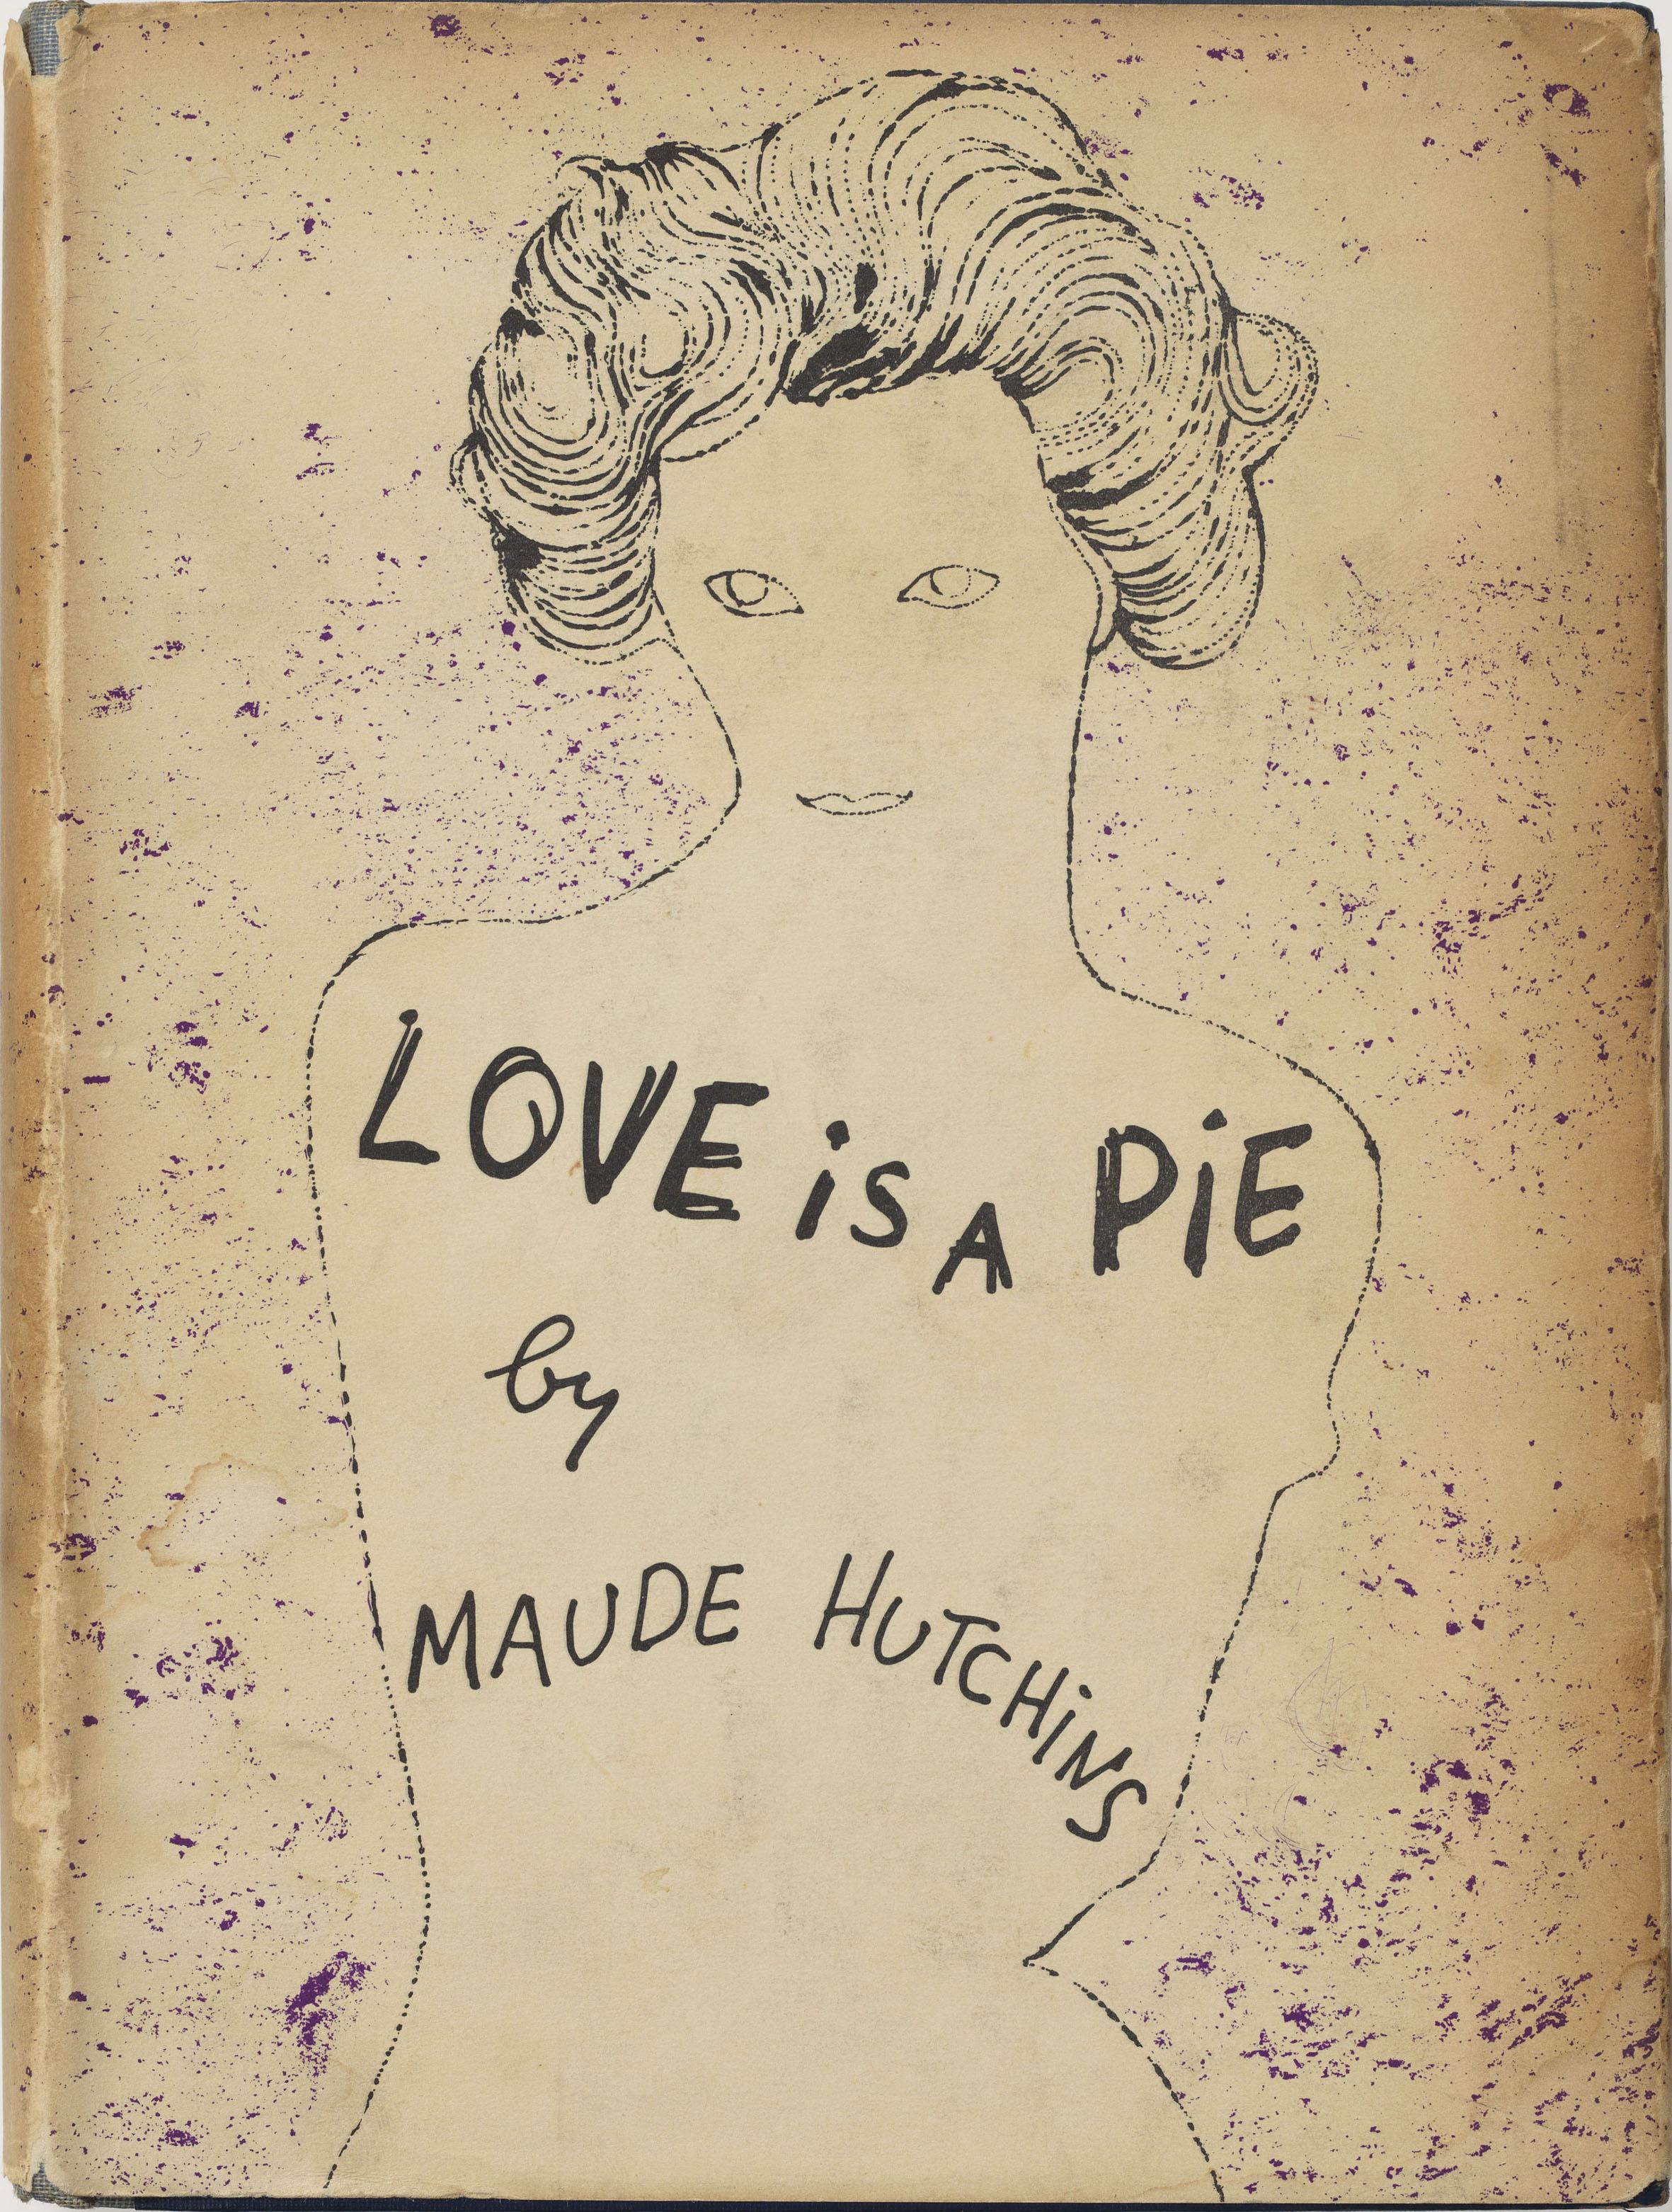 2013-09-24-Warhol_Loveisapie.jpg